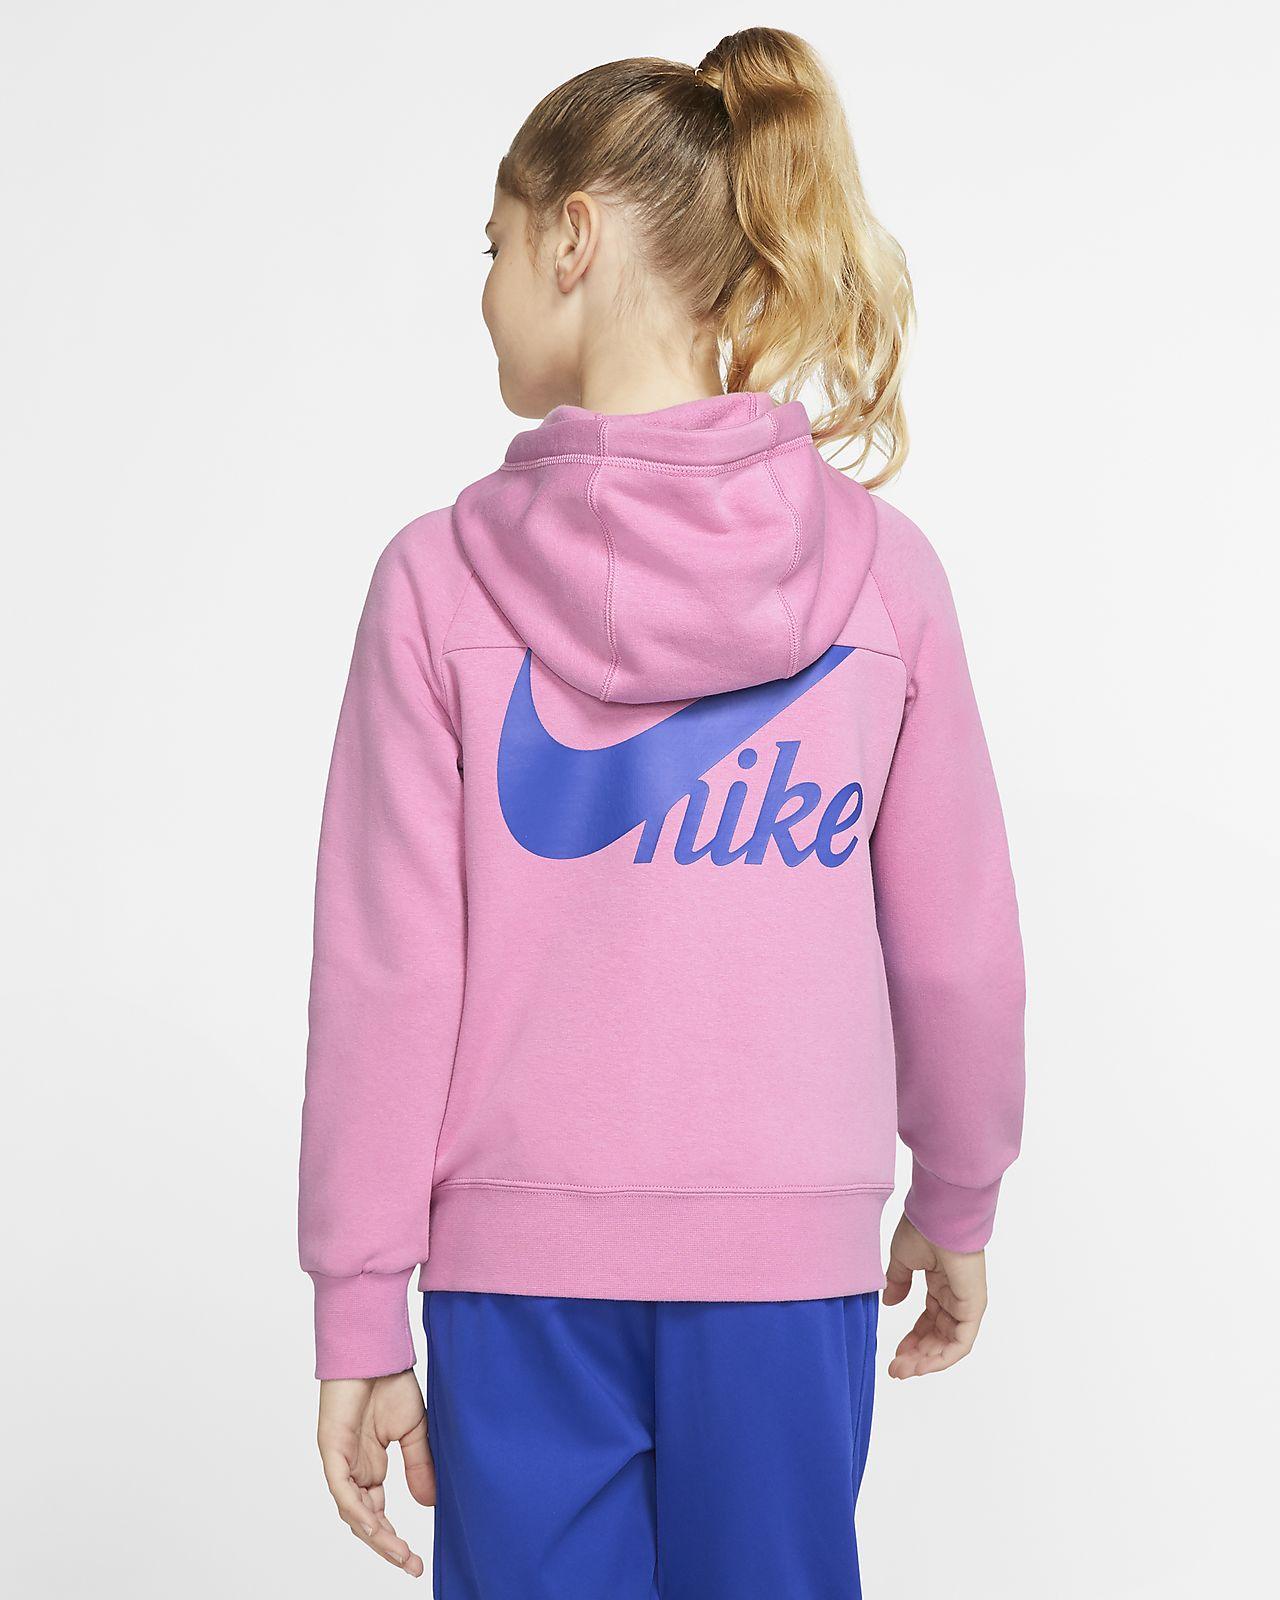 Hoodie com fecho completo Nike Sportswear Júnior (Rapariga)